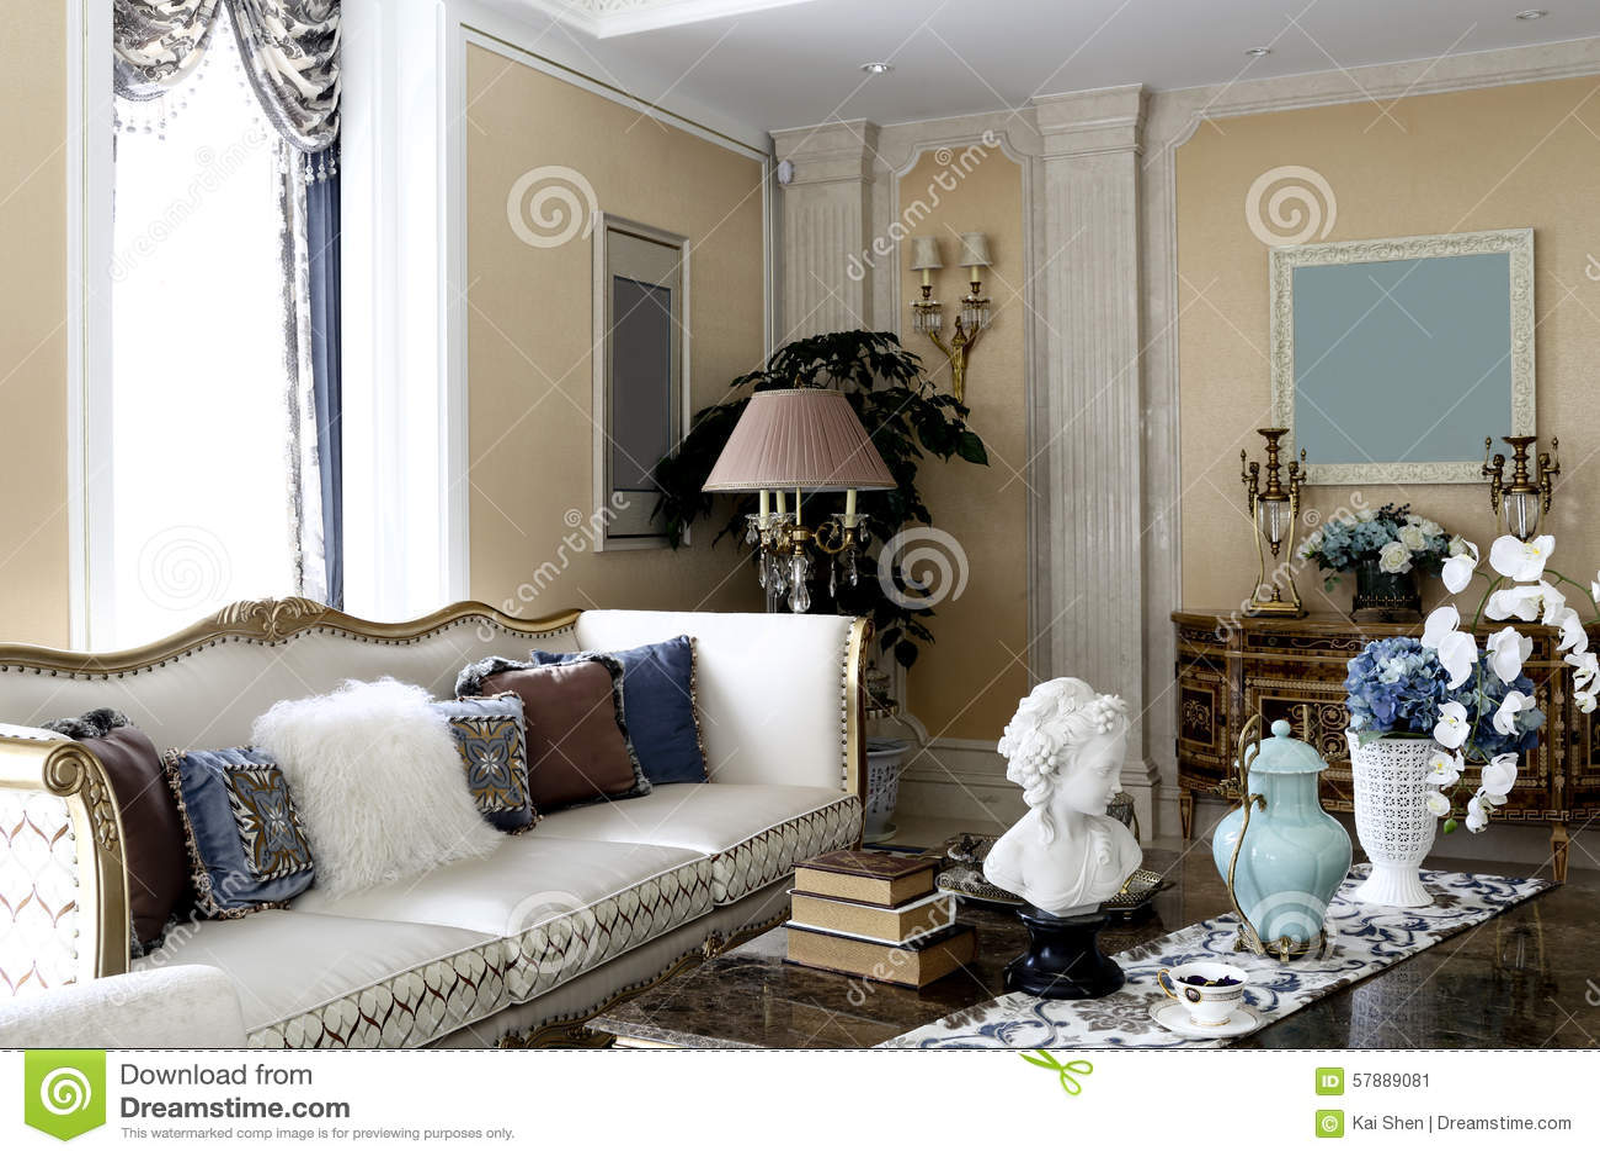 c2dce8d2bc2c9 Luz natural através da cortina, coxim no sofá elegante, escultura e vasos